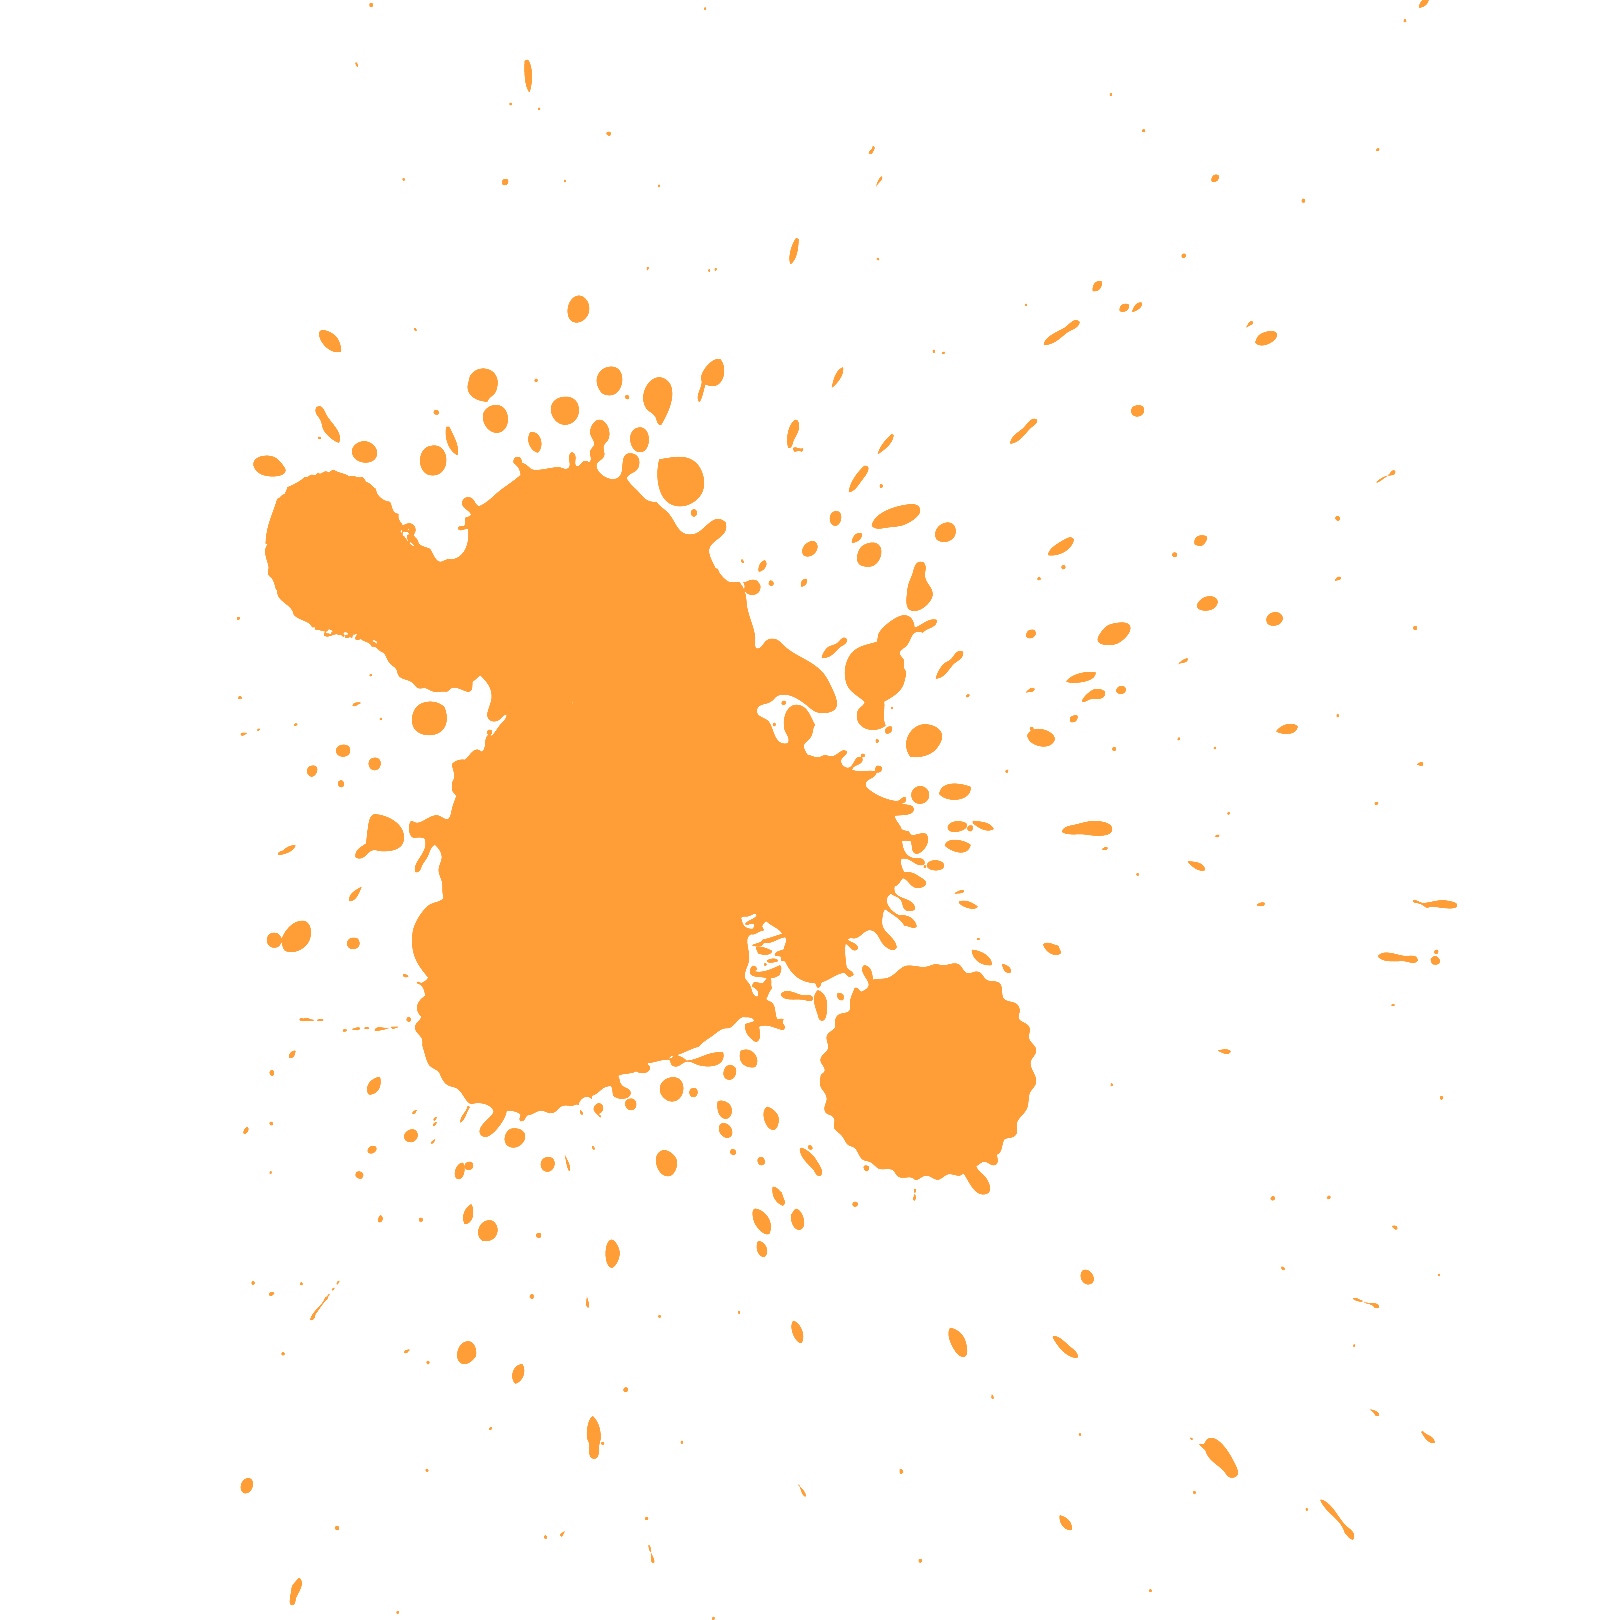 Mango clipart 1080p. Dirt hole valuedirectories info